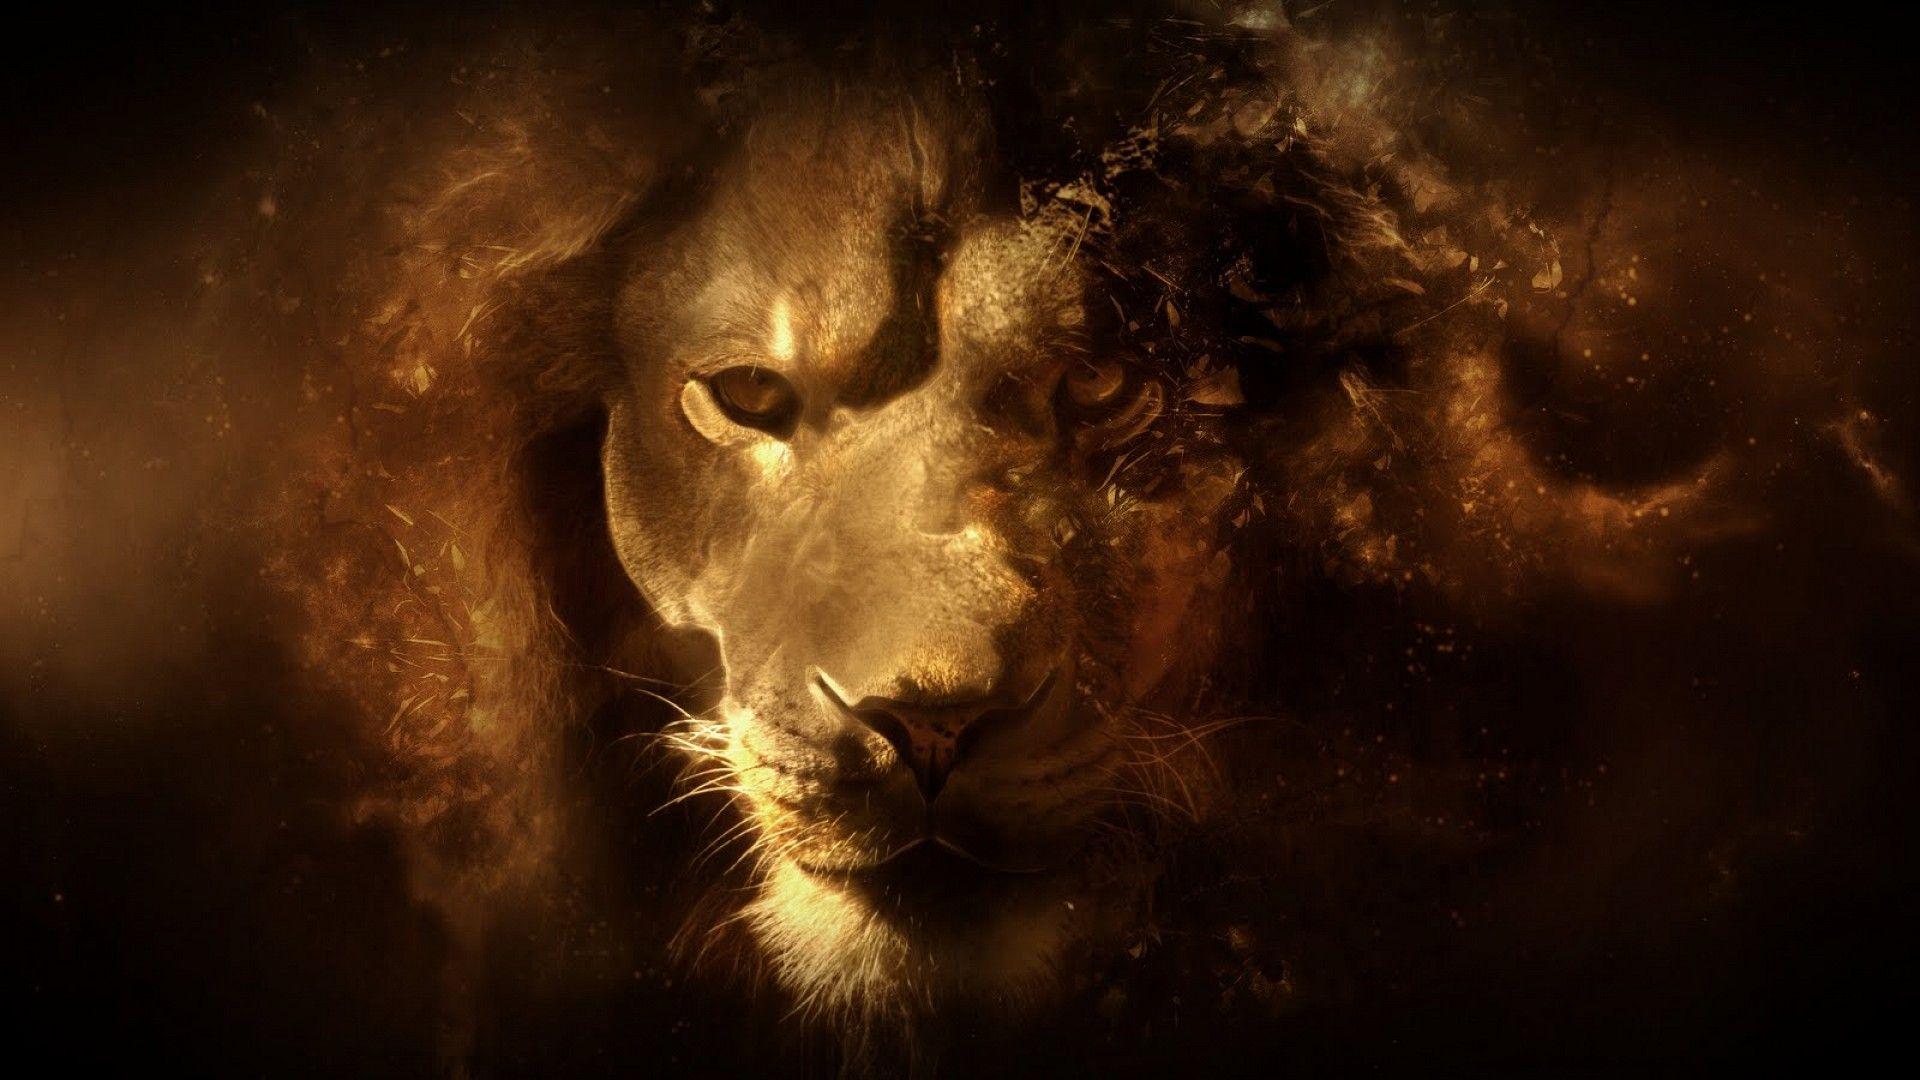 3d Fantasy Lion Wallpaper Buyuk Kediler Aslanlar Kedi